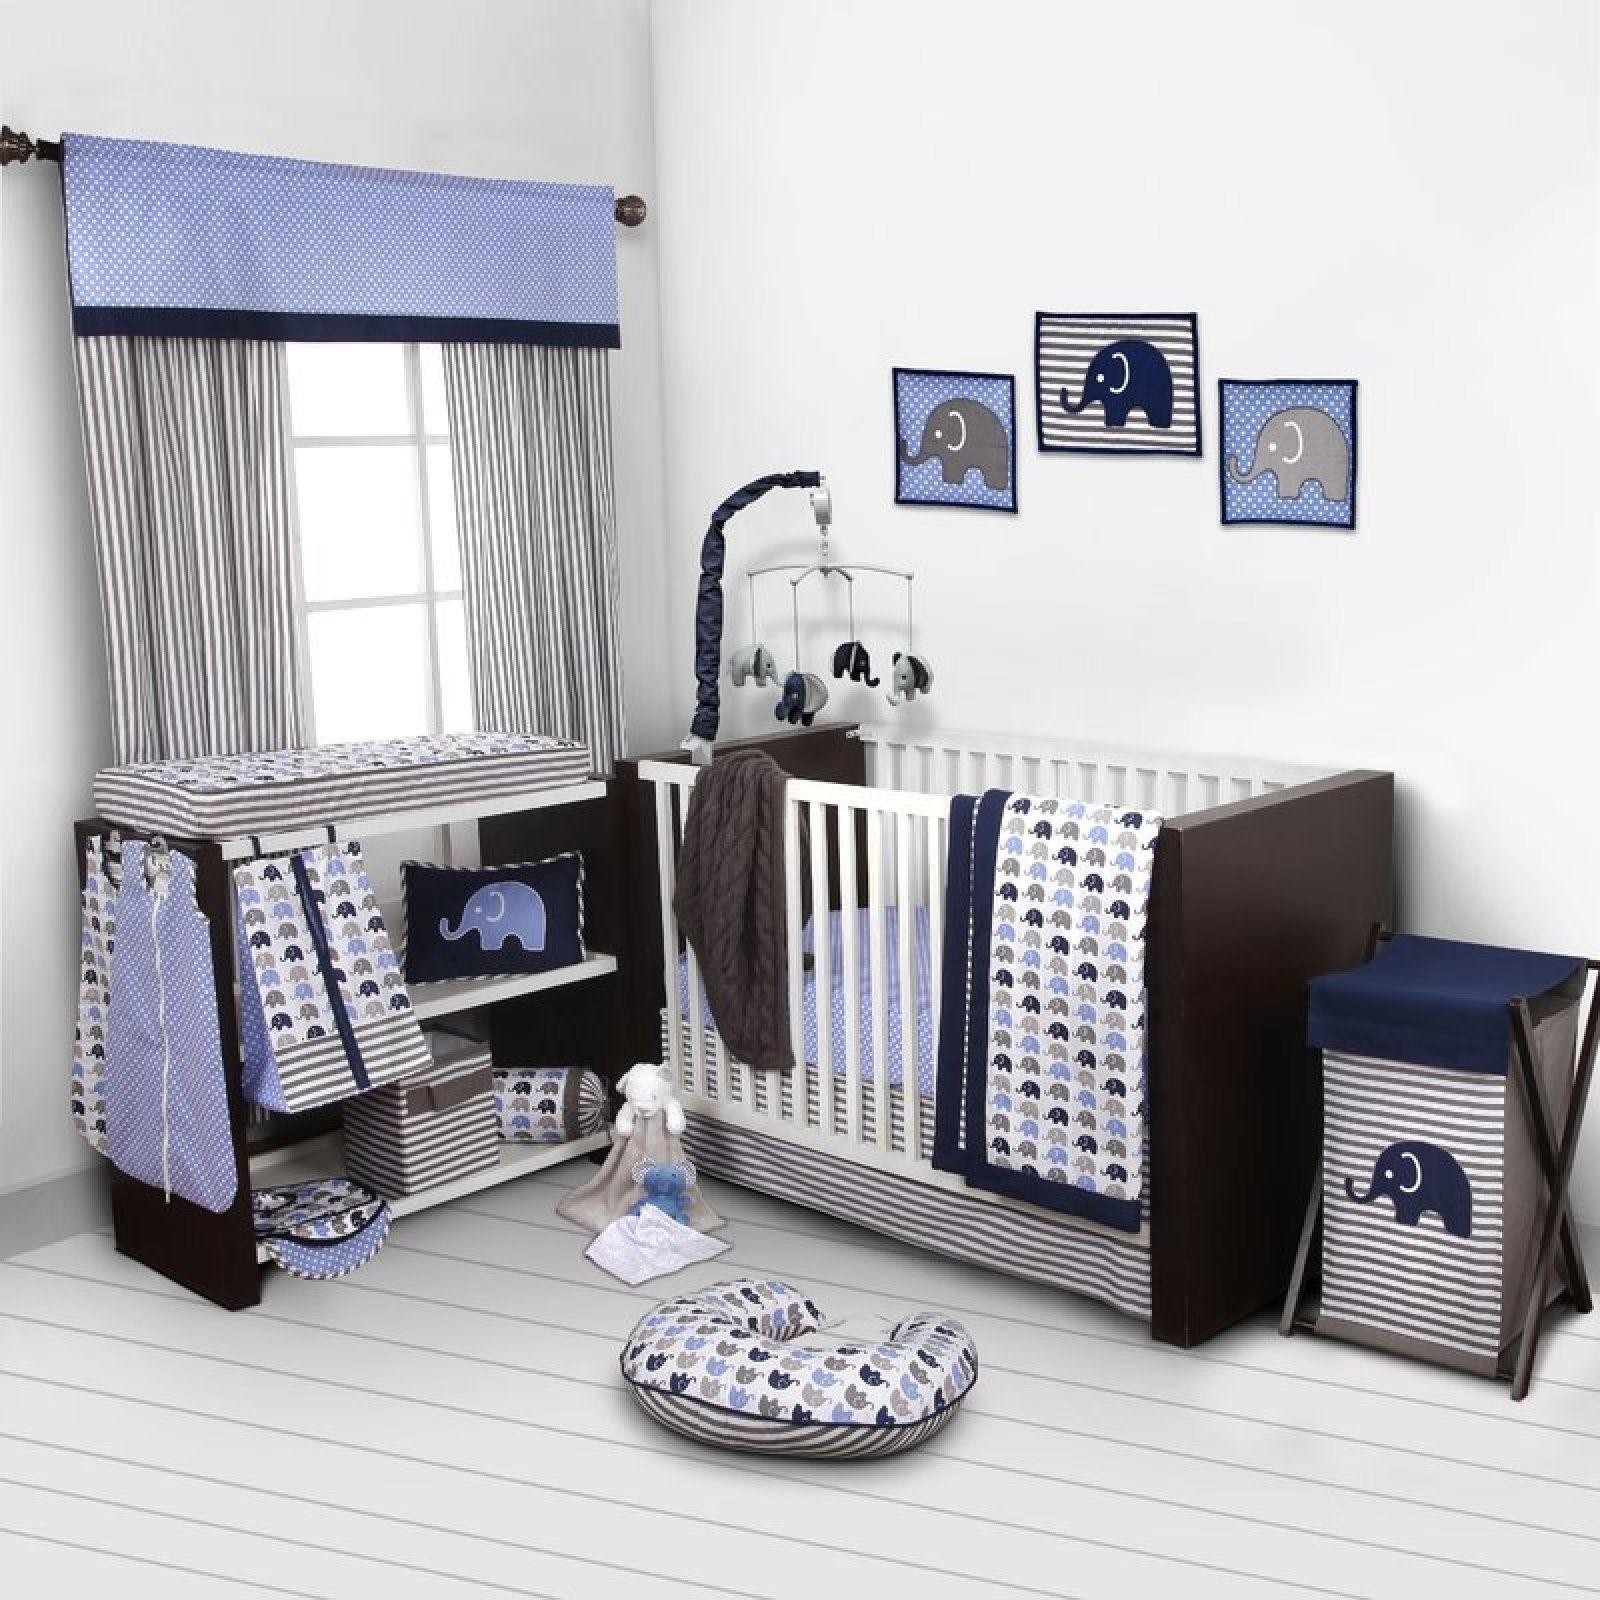 Baby Crib Nursery Bedding Set Boy Girl Quilt Comforter Diaper